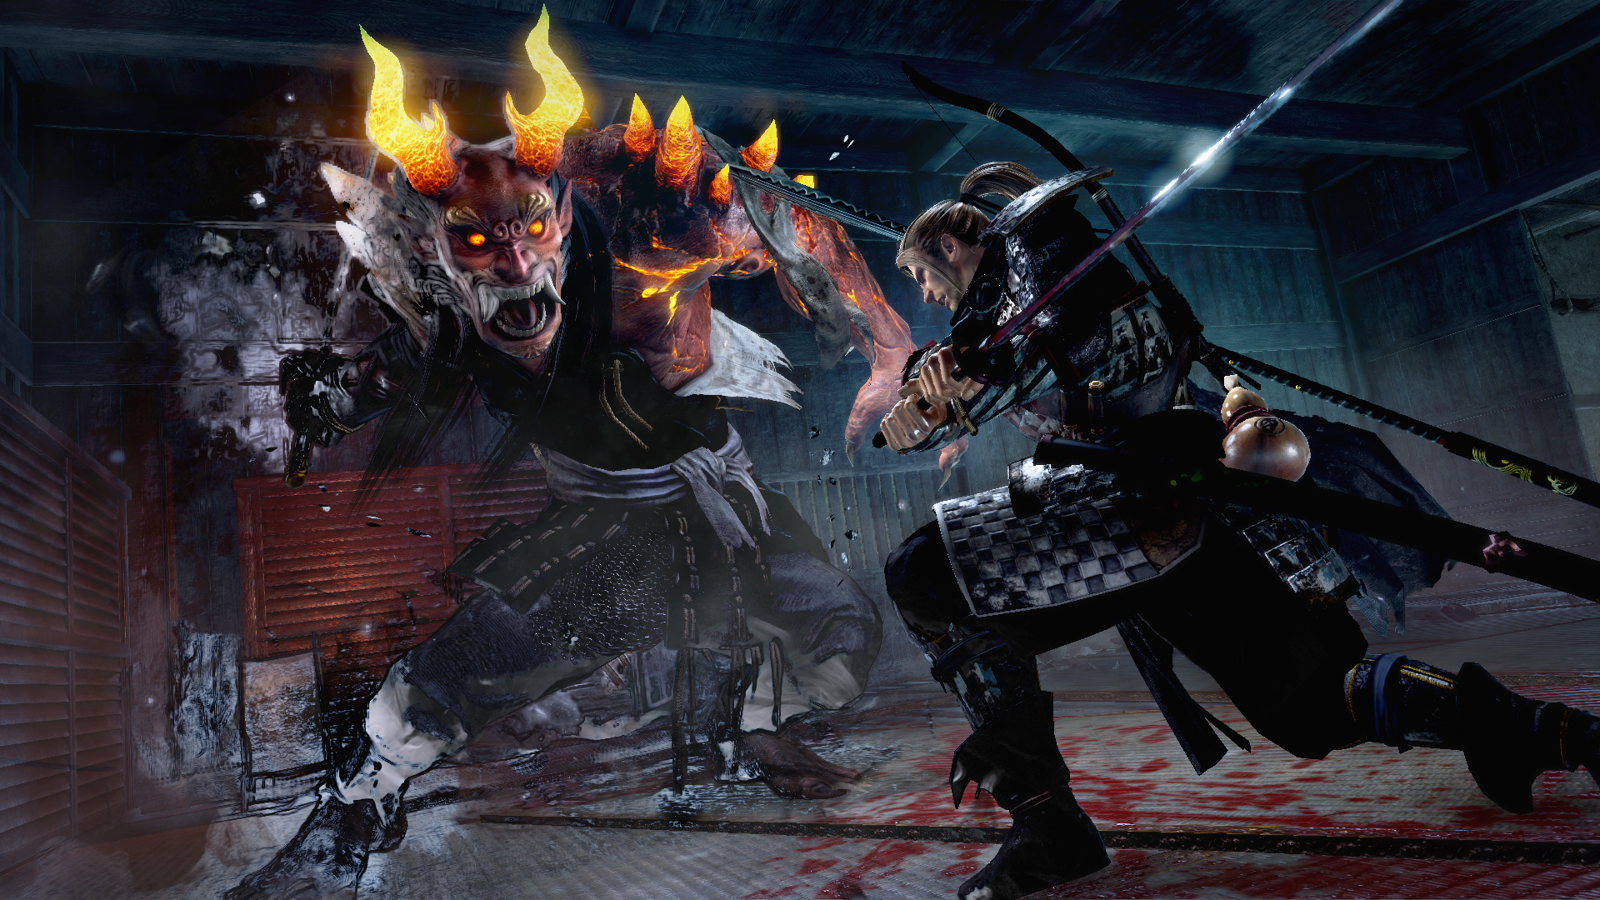 Nioh: Complete Edition (PC) Review - Samurai Souls Comes to PC 5